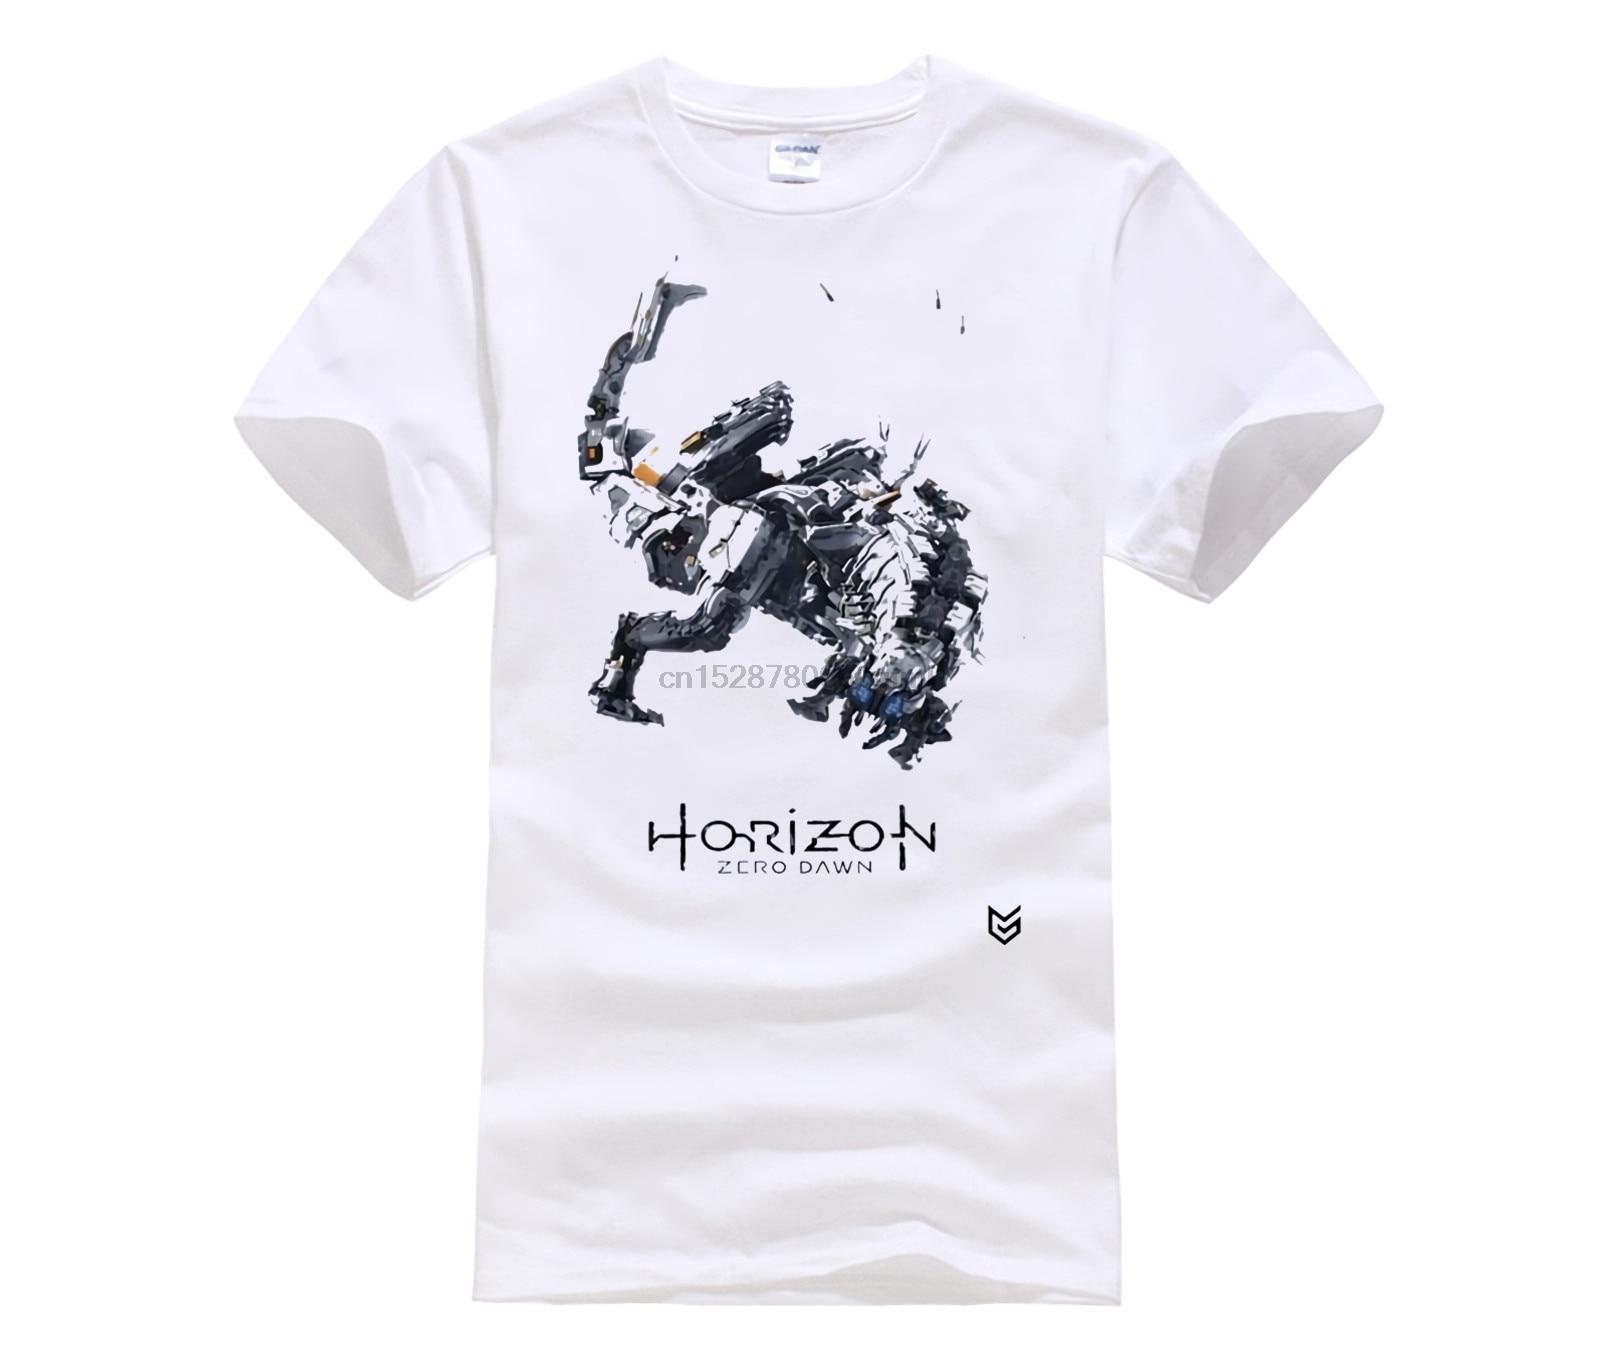 Camiseta informal a la moda para hombre, camiseta Cool Mans con cuello redondo, camisetas de moda para hombre, juego Horizon Zero Dawn, Camisetas estampadas